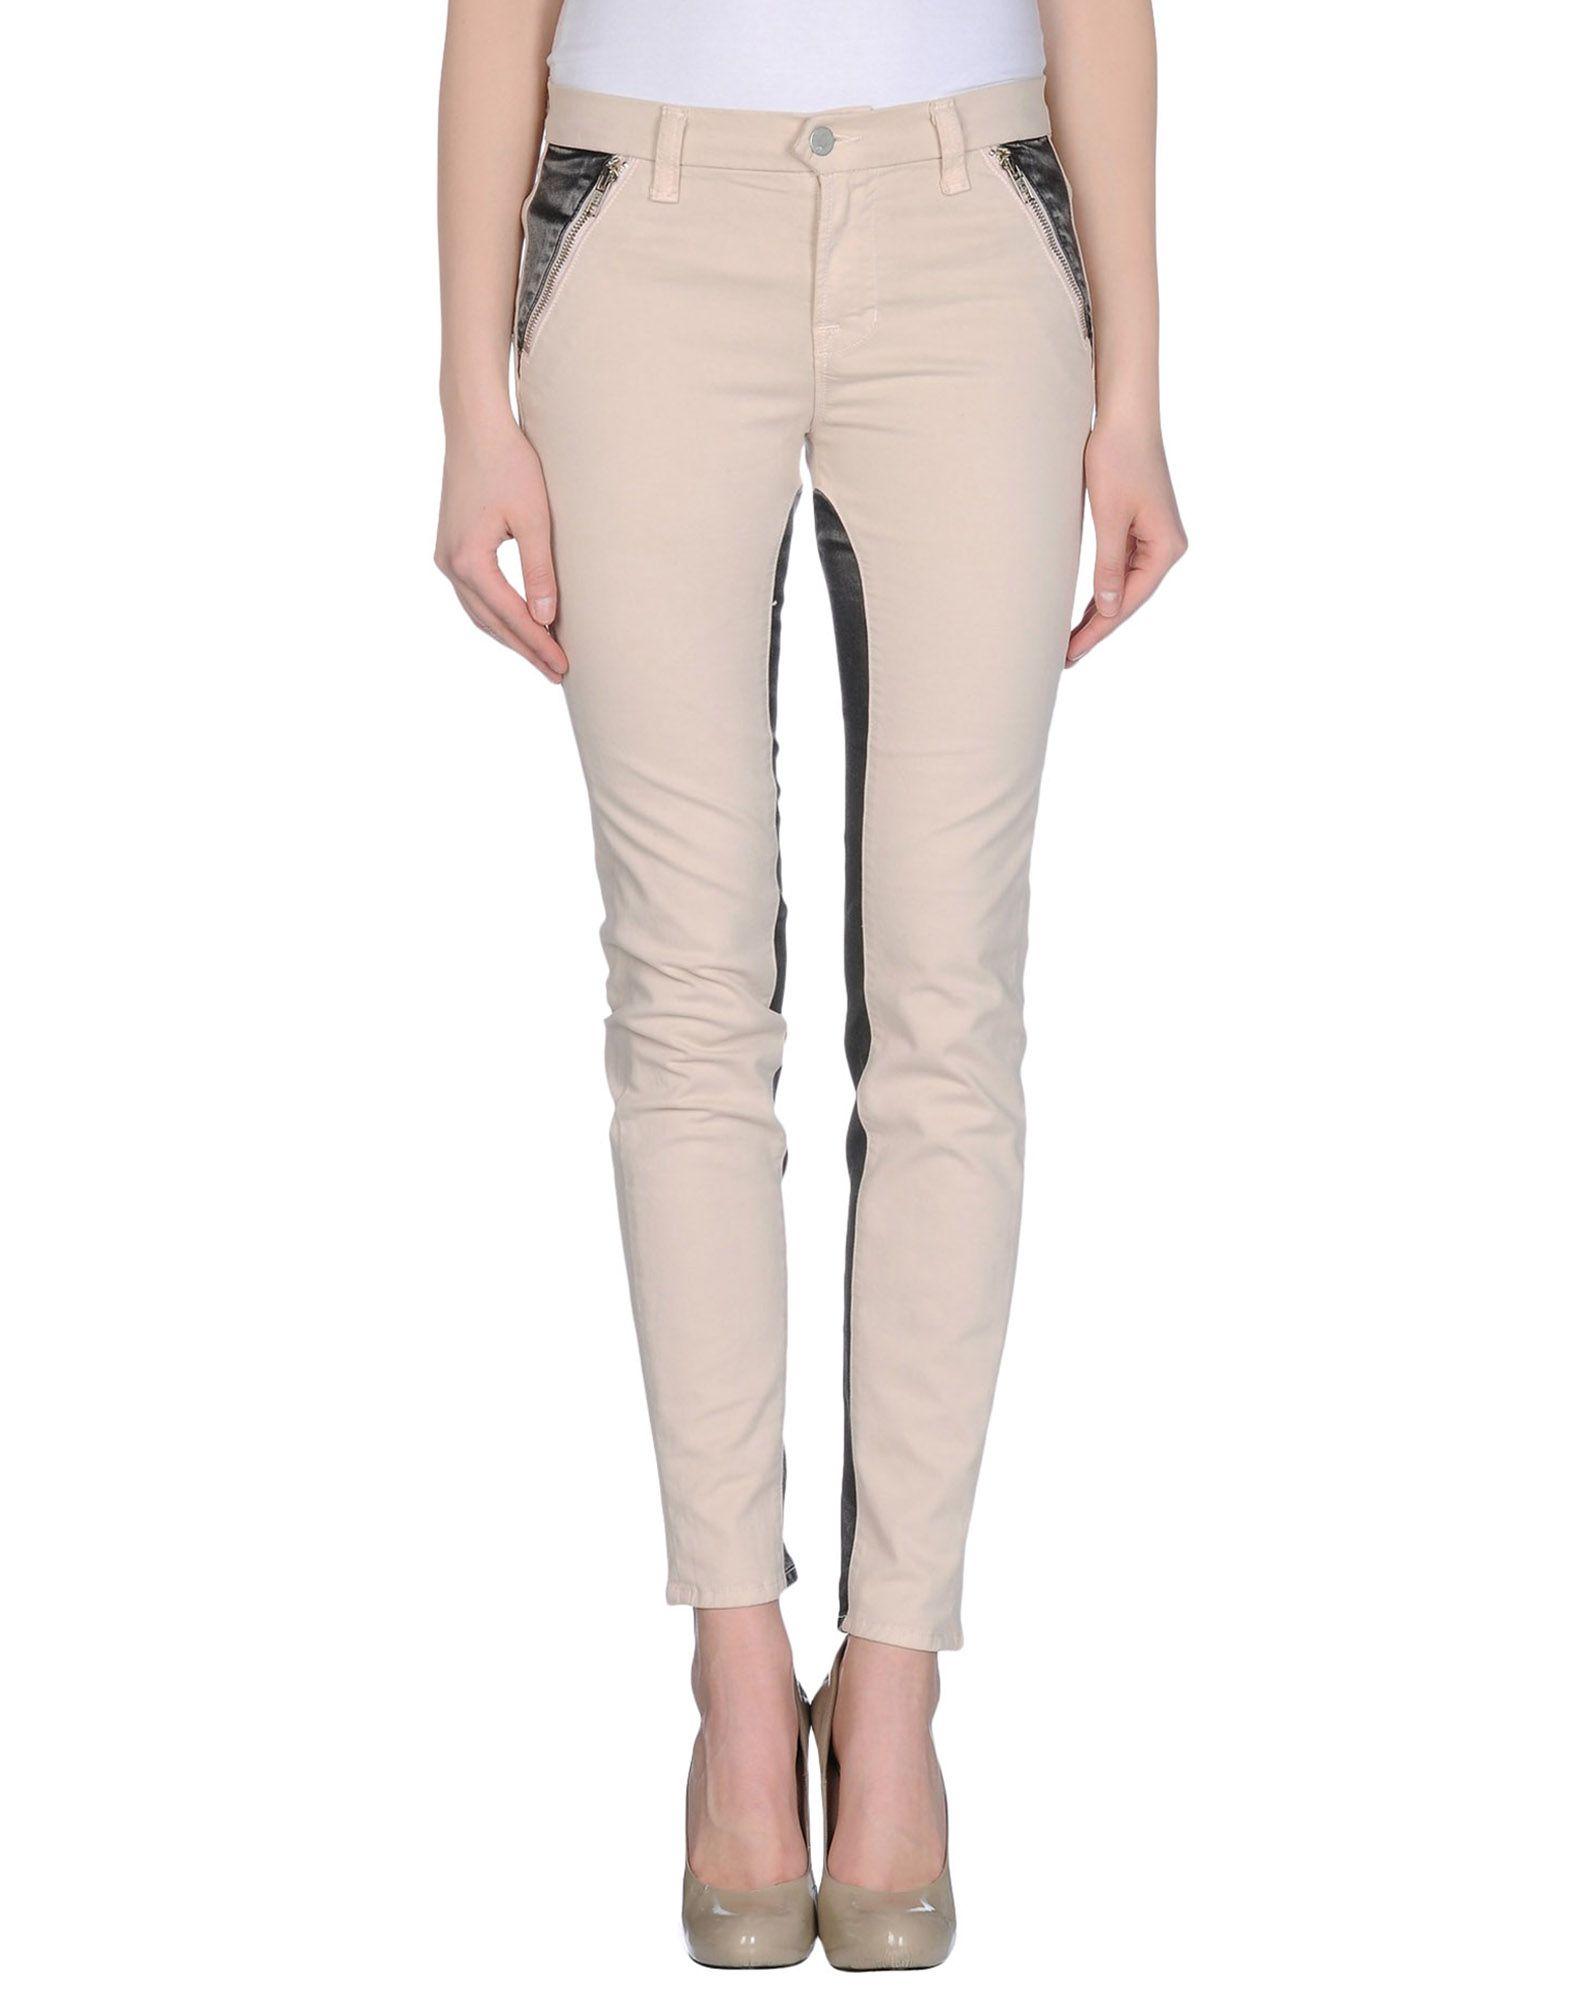 Pantalone J Brand Donna - Acquista online su Rnoui8Mnq